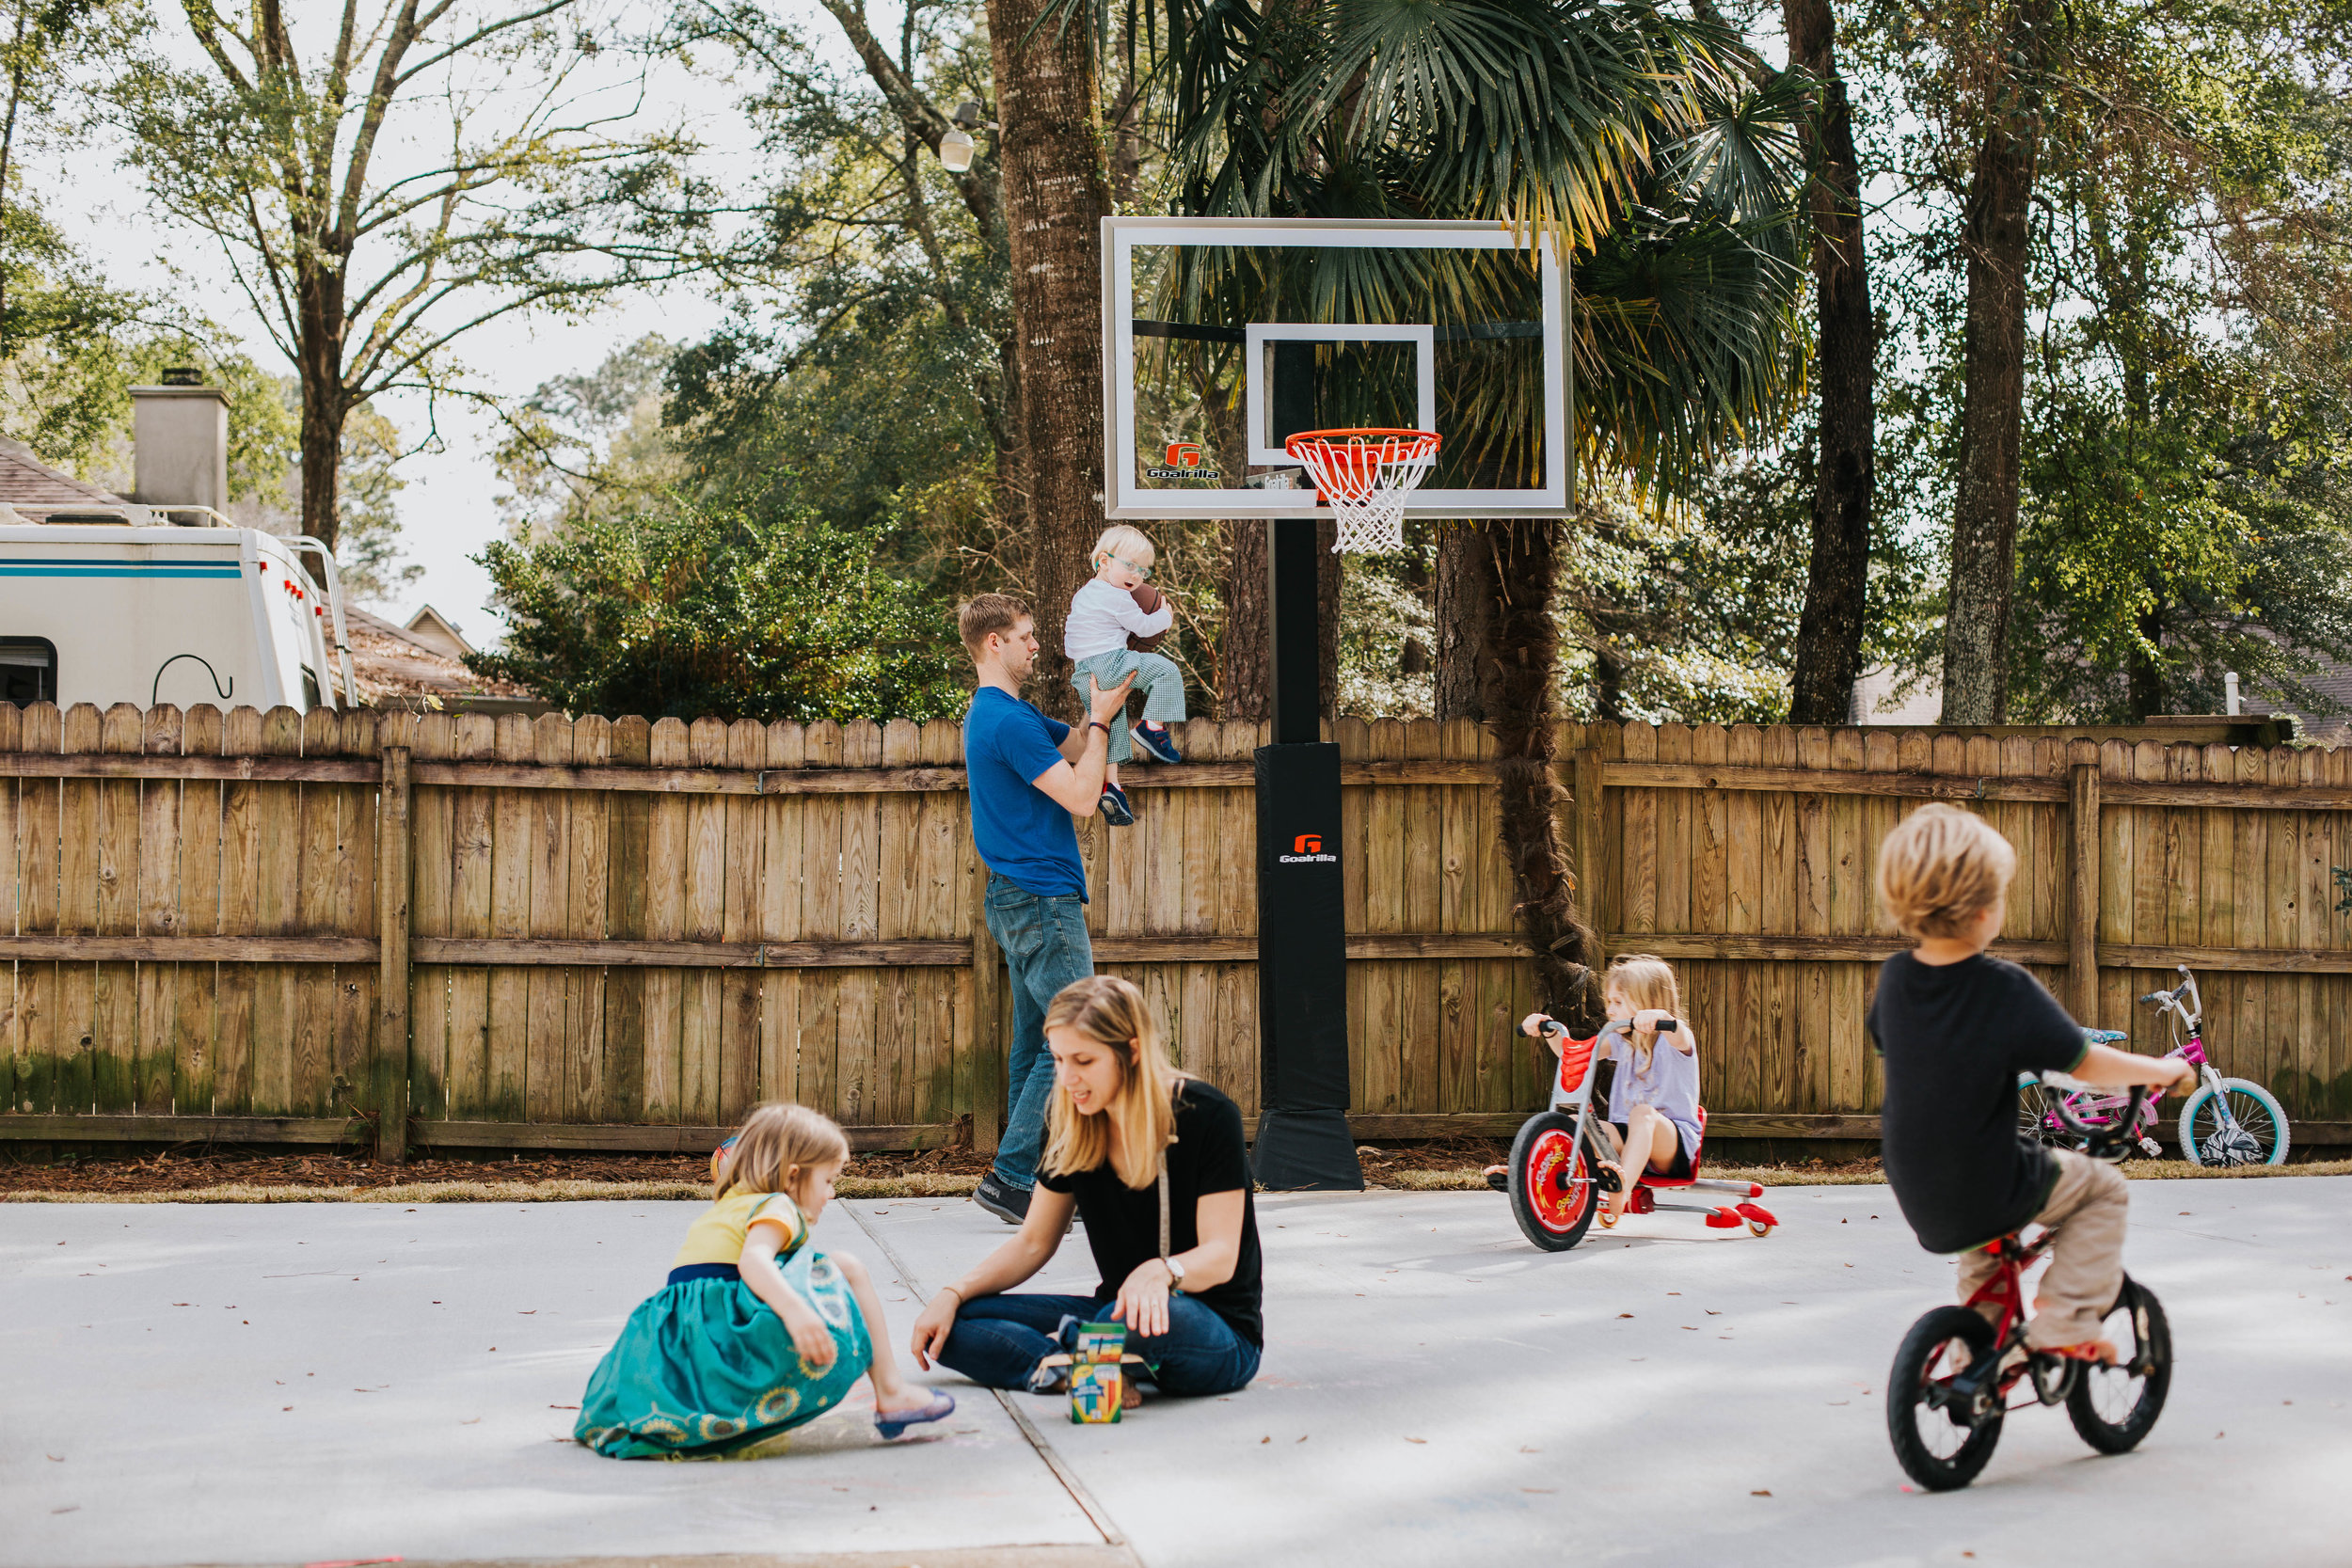 Fairhope Alabama Family playing in Backyard